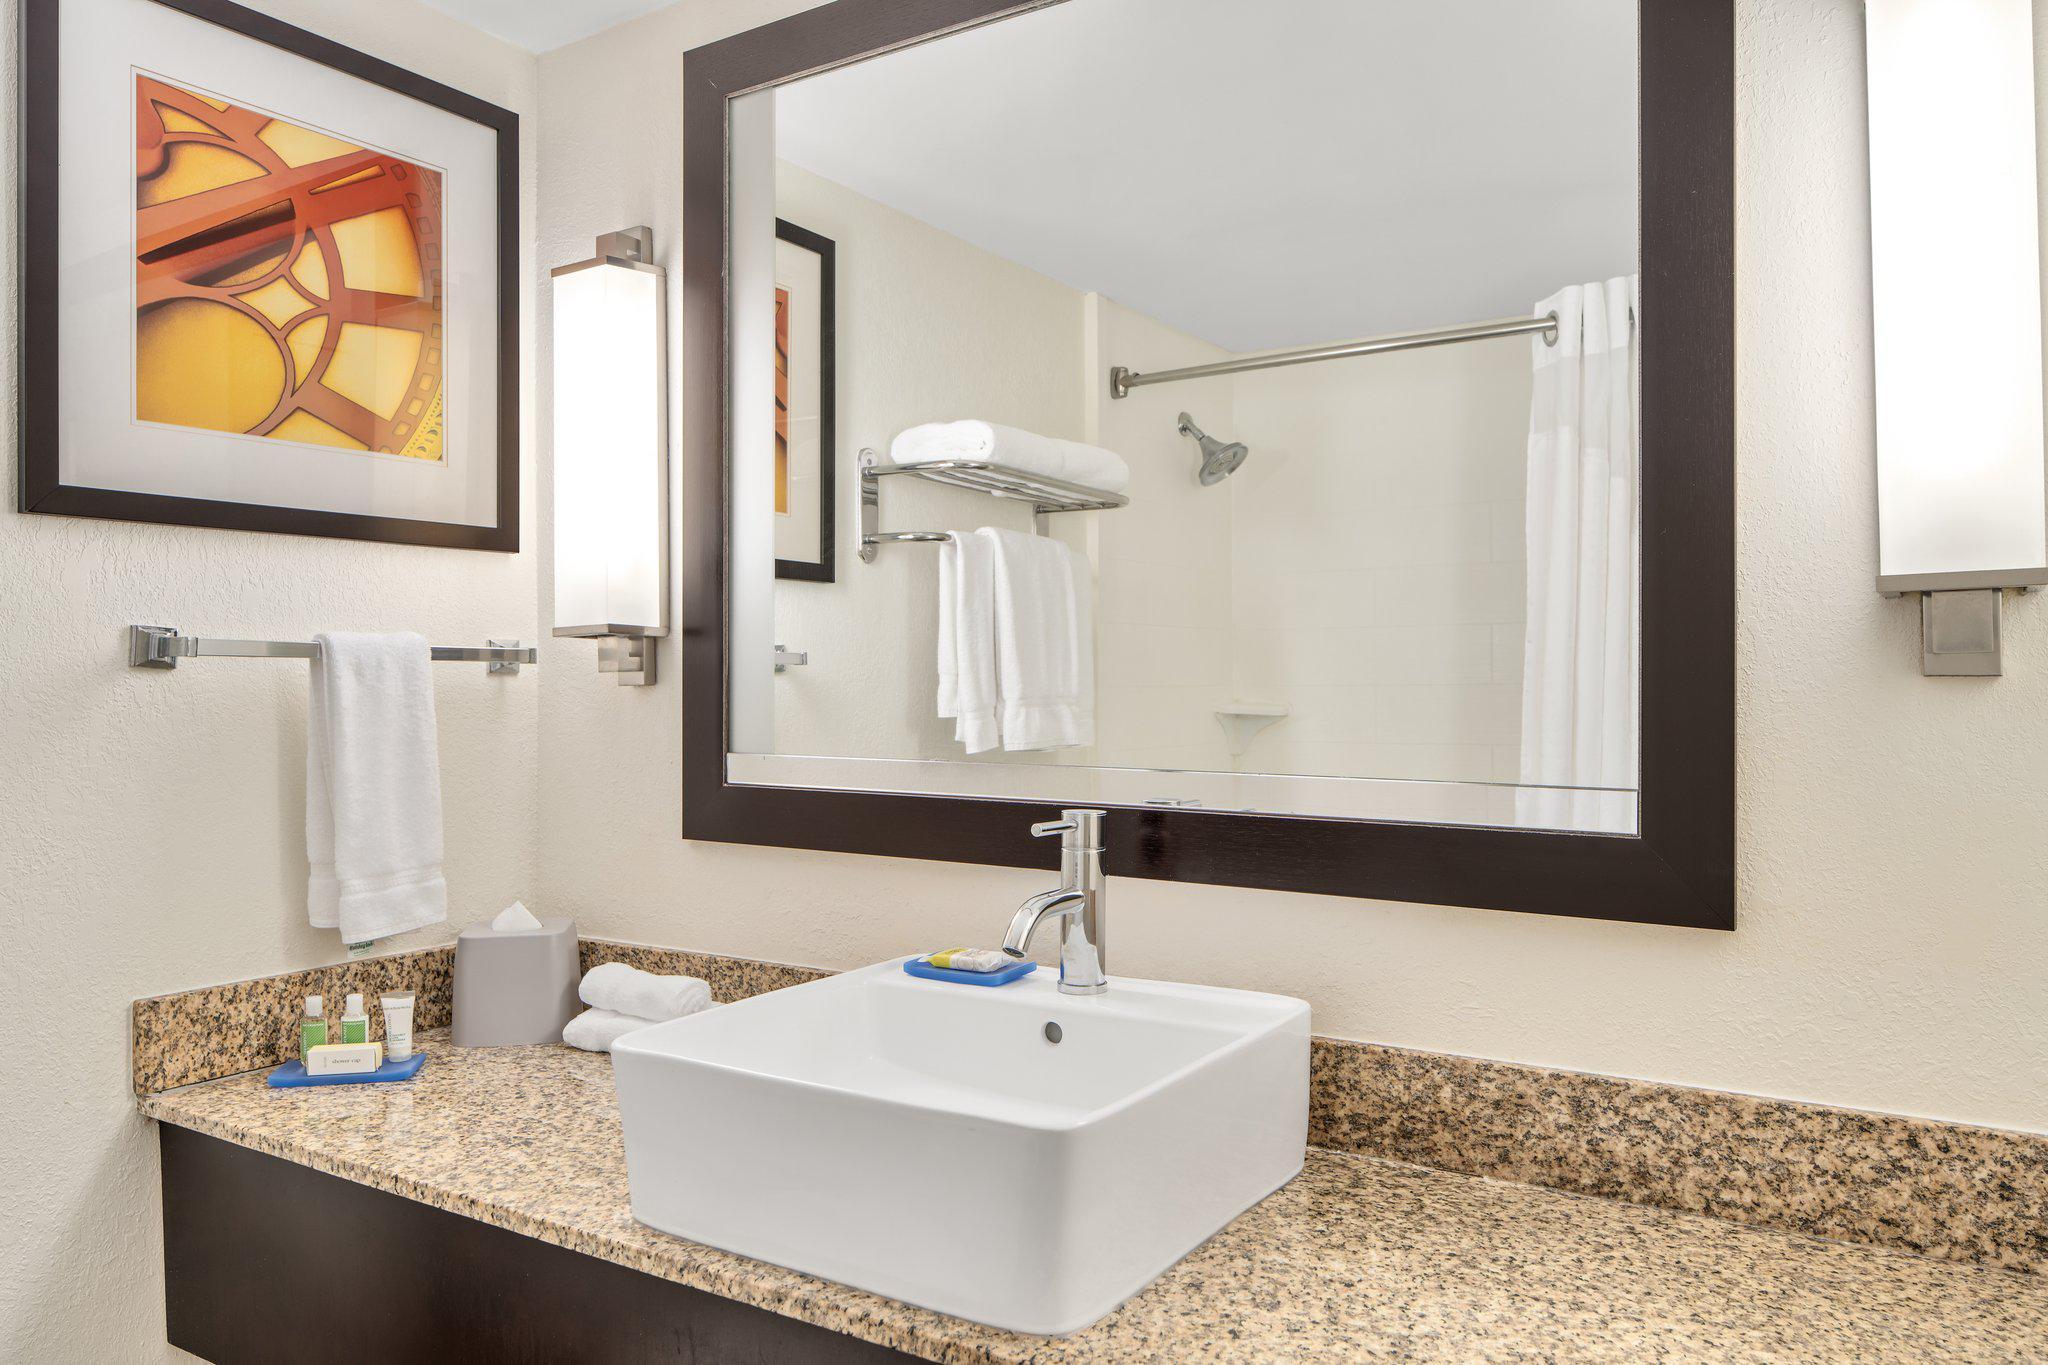 Holiday Inn Express Ft. Lauderdale Cruise-Airport, an IHG Hotel